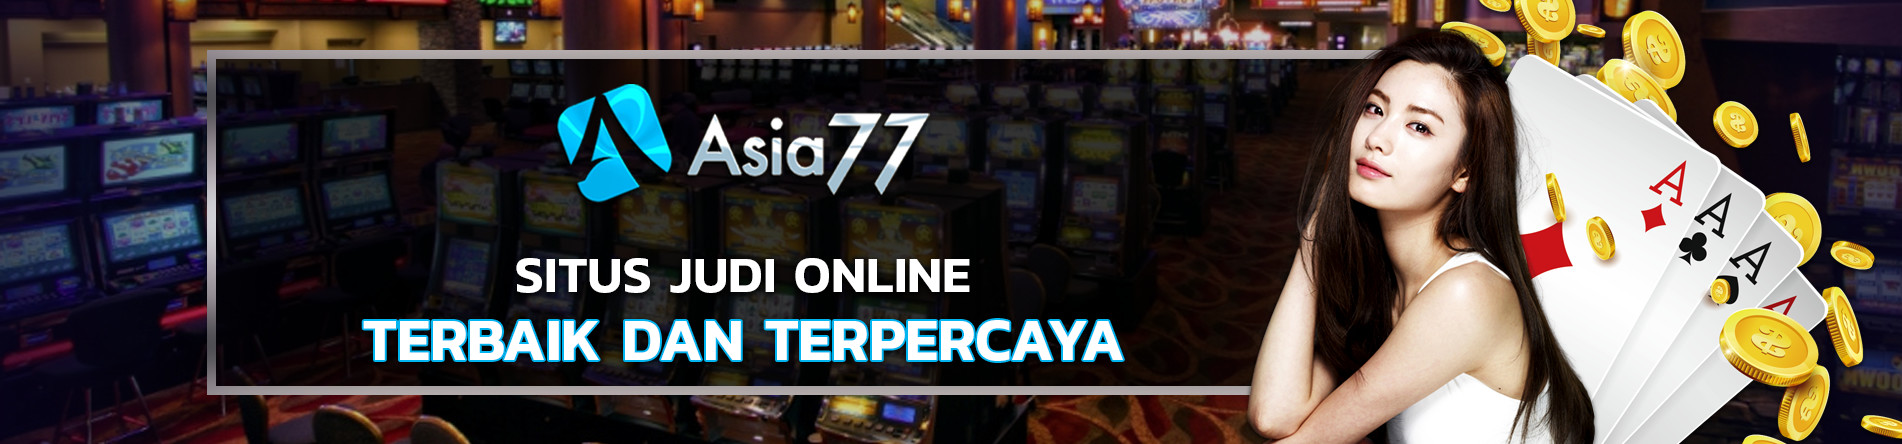 Asia77 Situs Judi Slot online